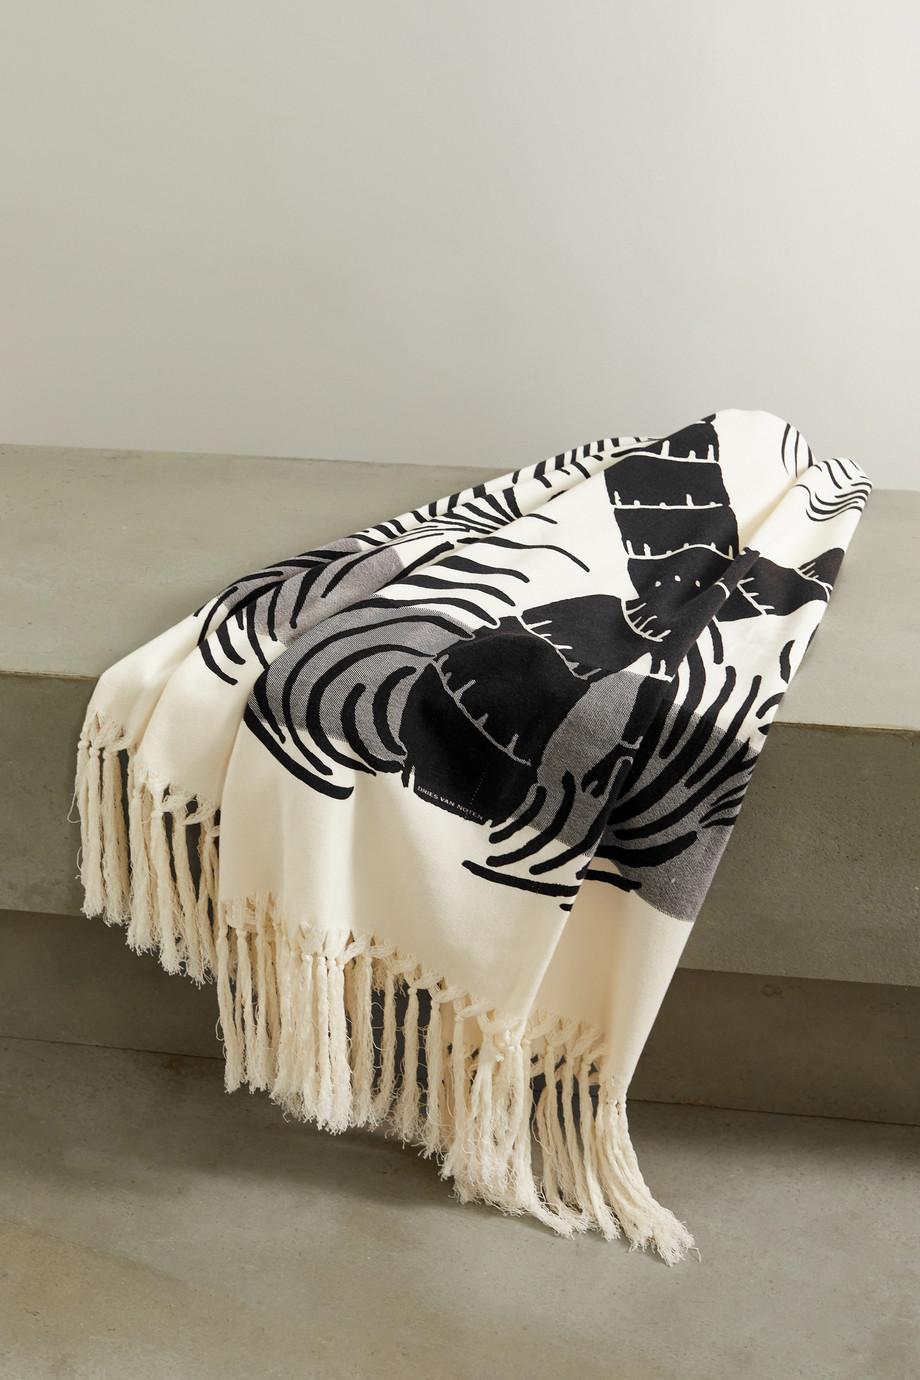 Dries Van Noten Goldie cotton-terry jacquard towel